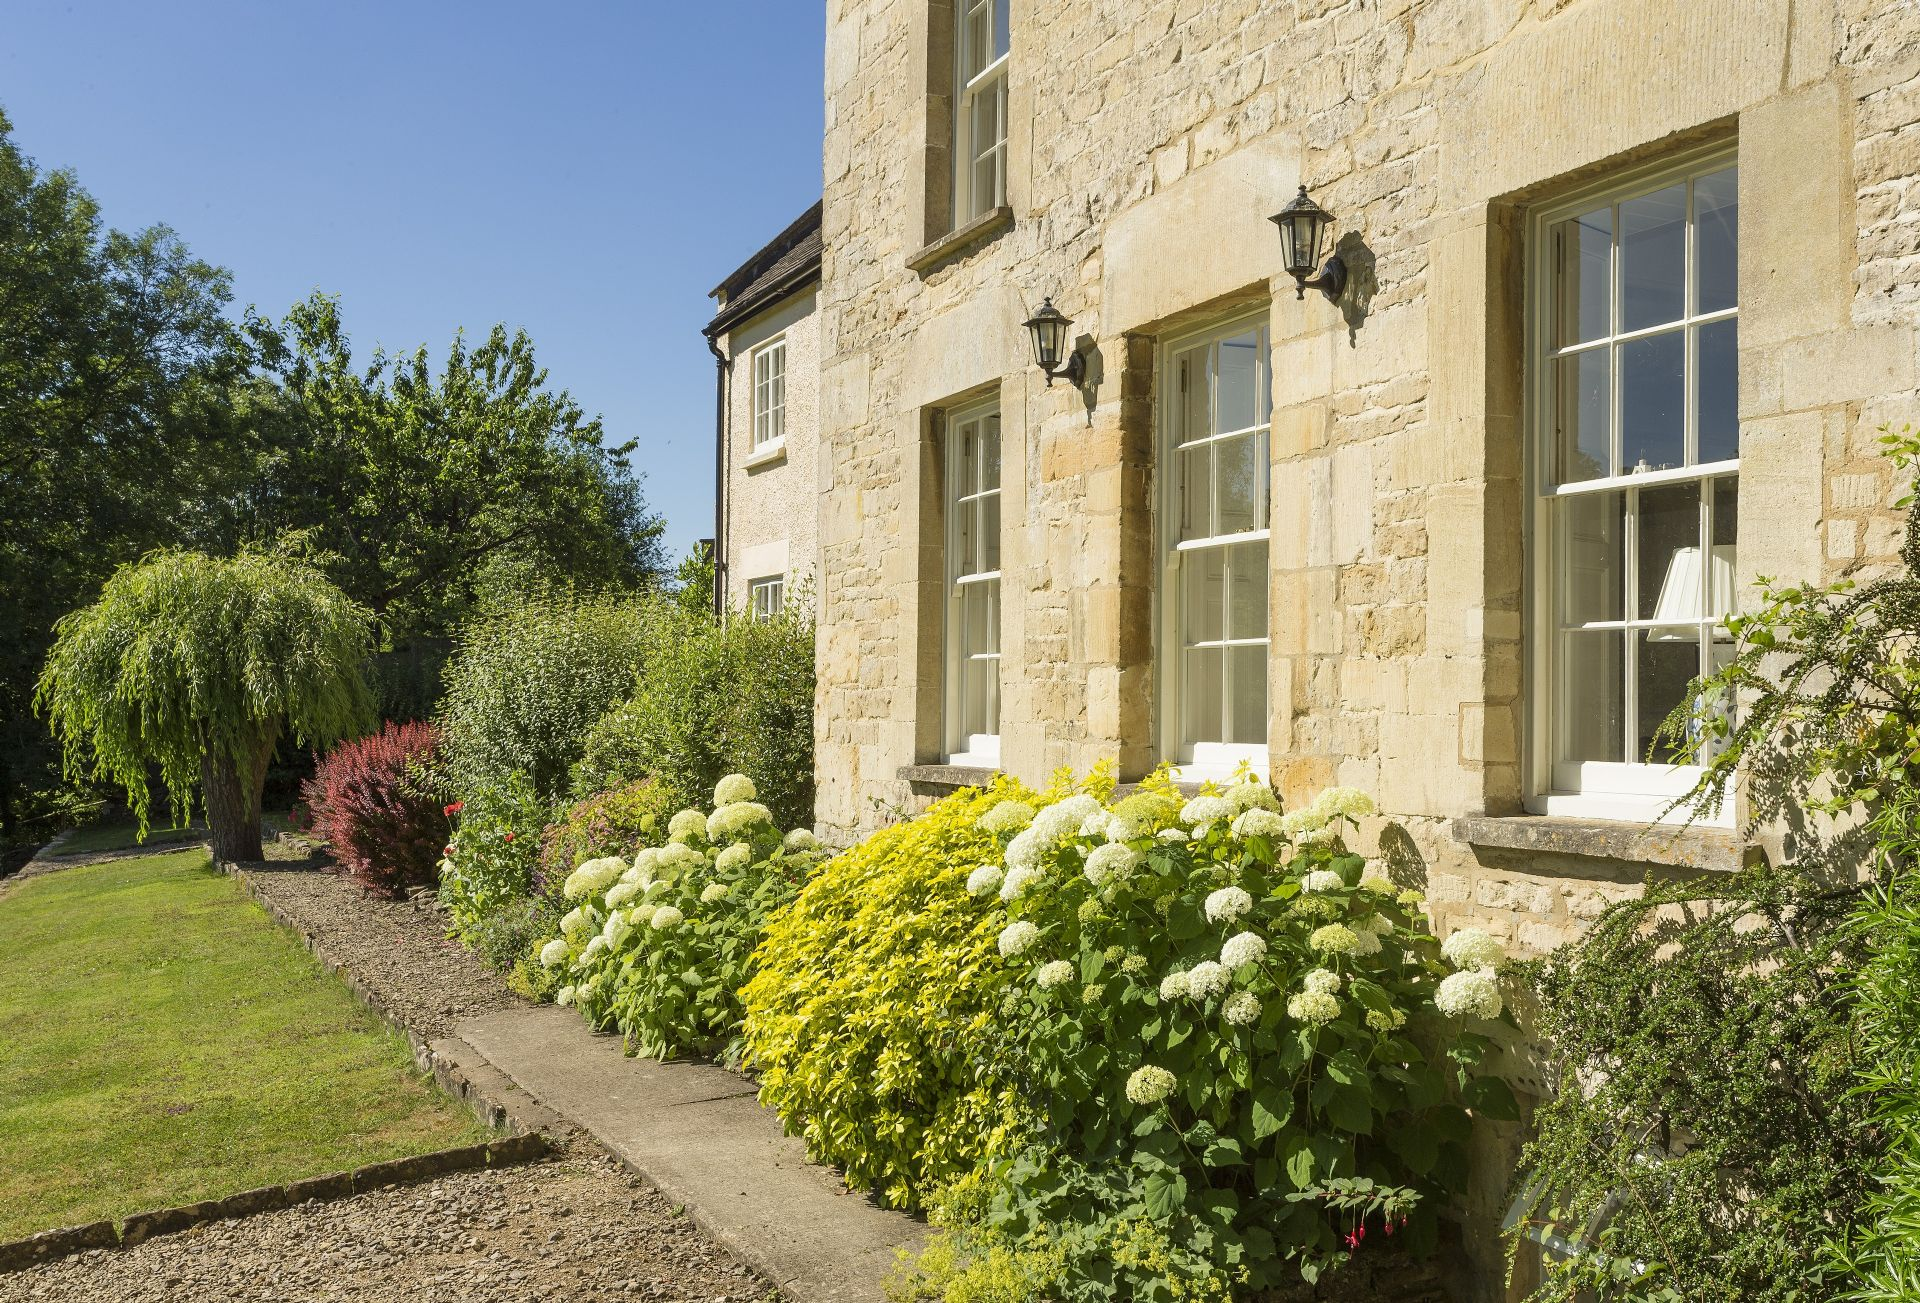 Beautiful gardens surround Catalpa Cottage